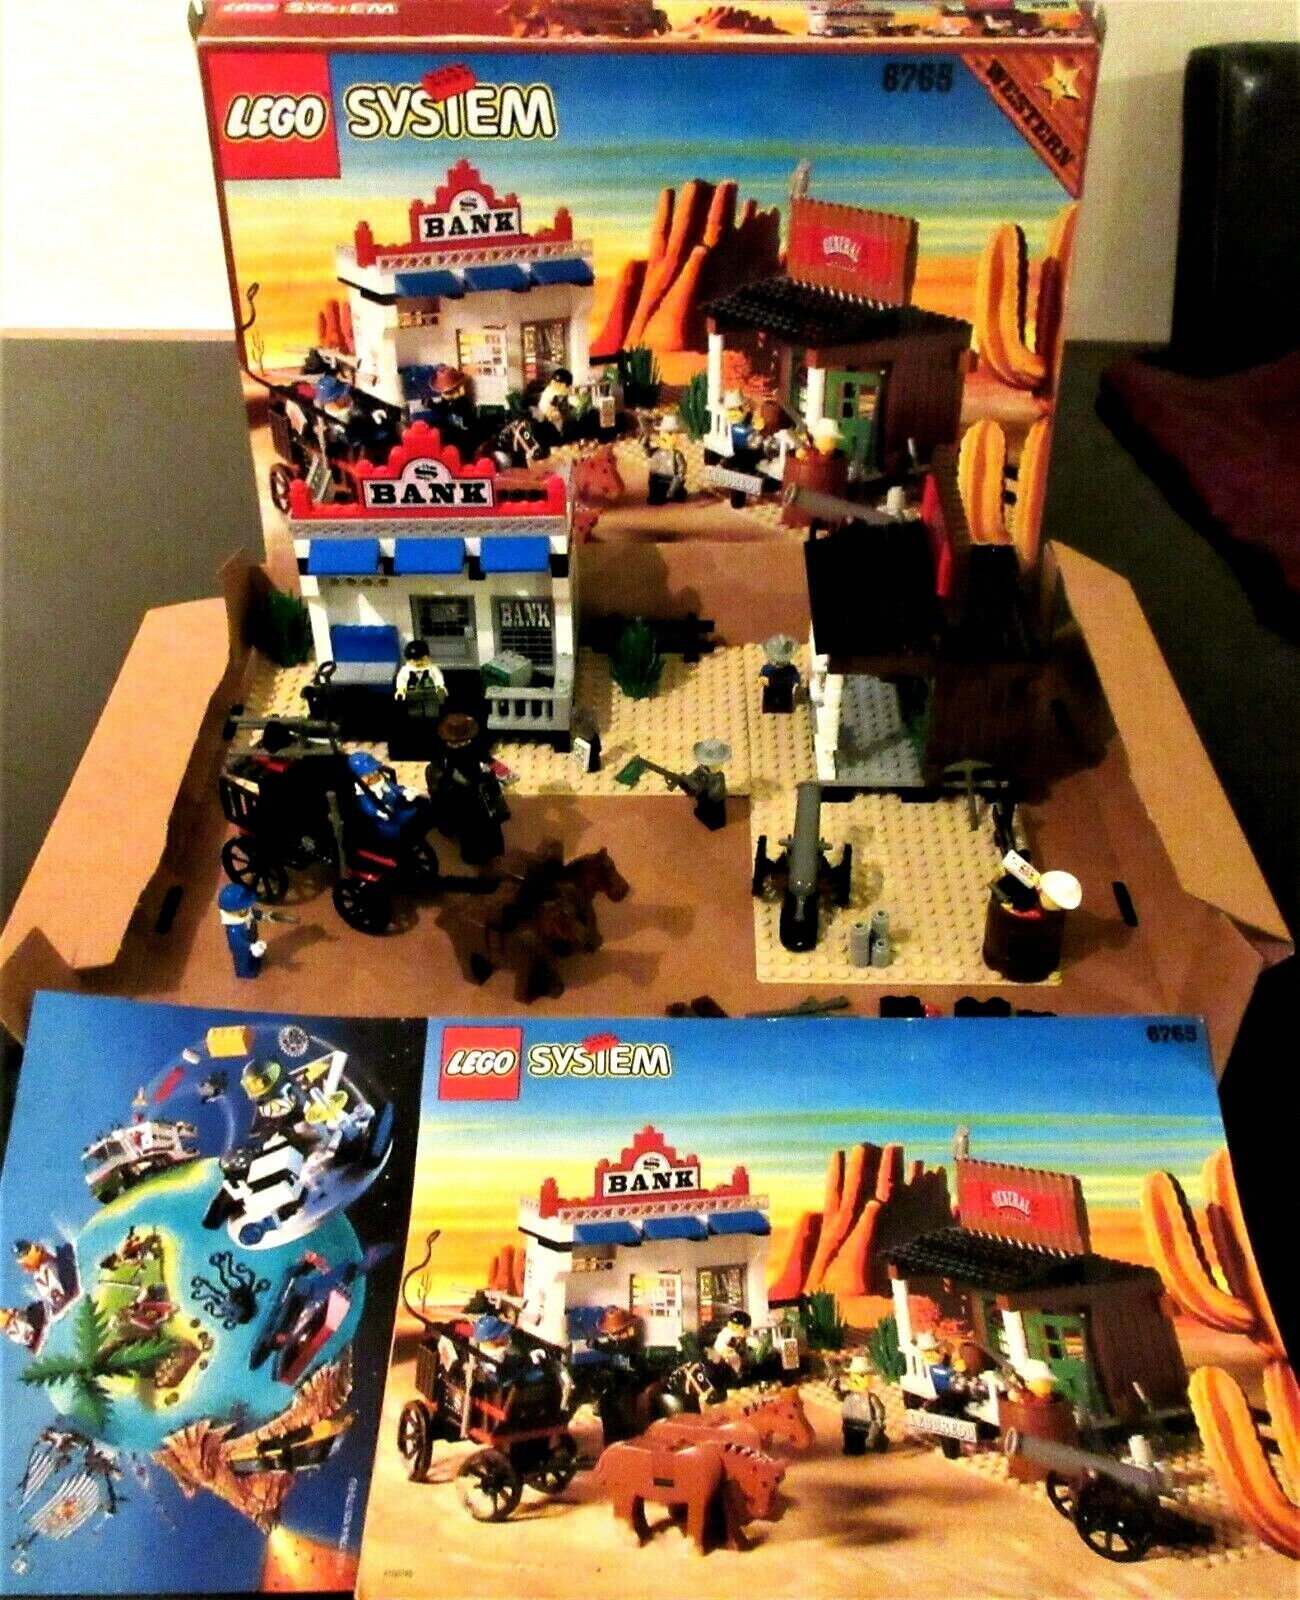 VINTAGE RARE LEGO SYSTEM SET 6765 WESTERN - Gold CITY JUNCTION - 1996 BOXED